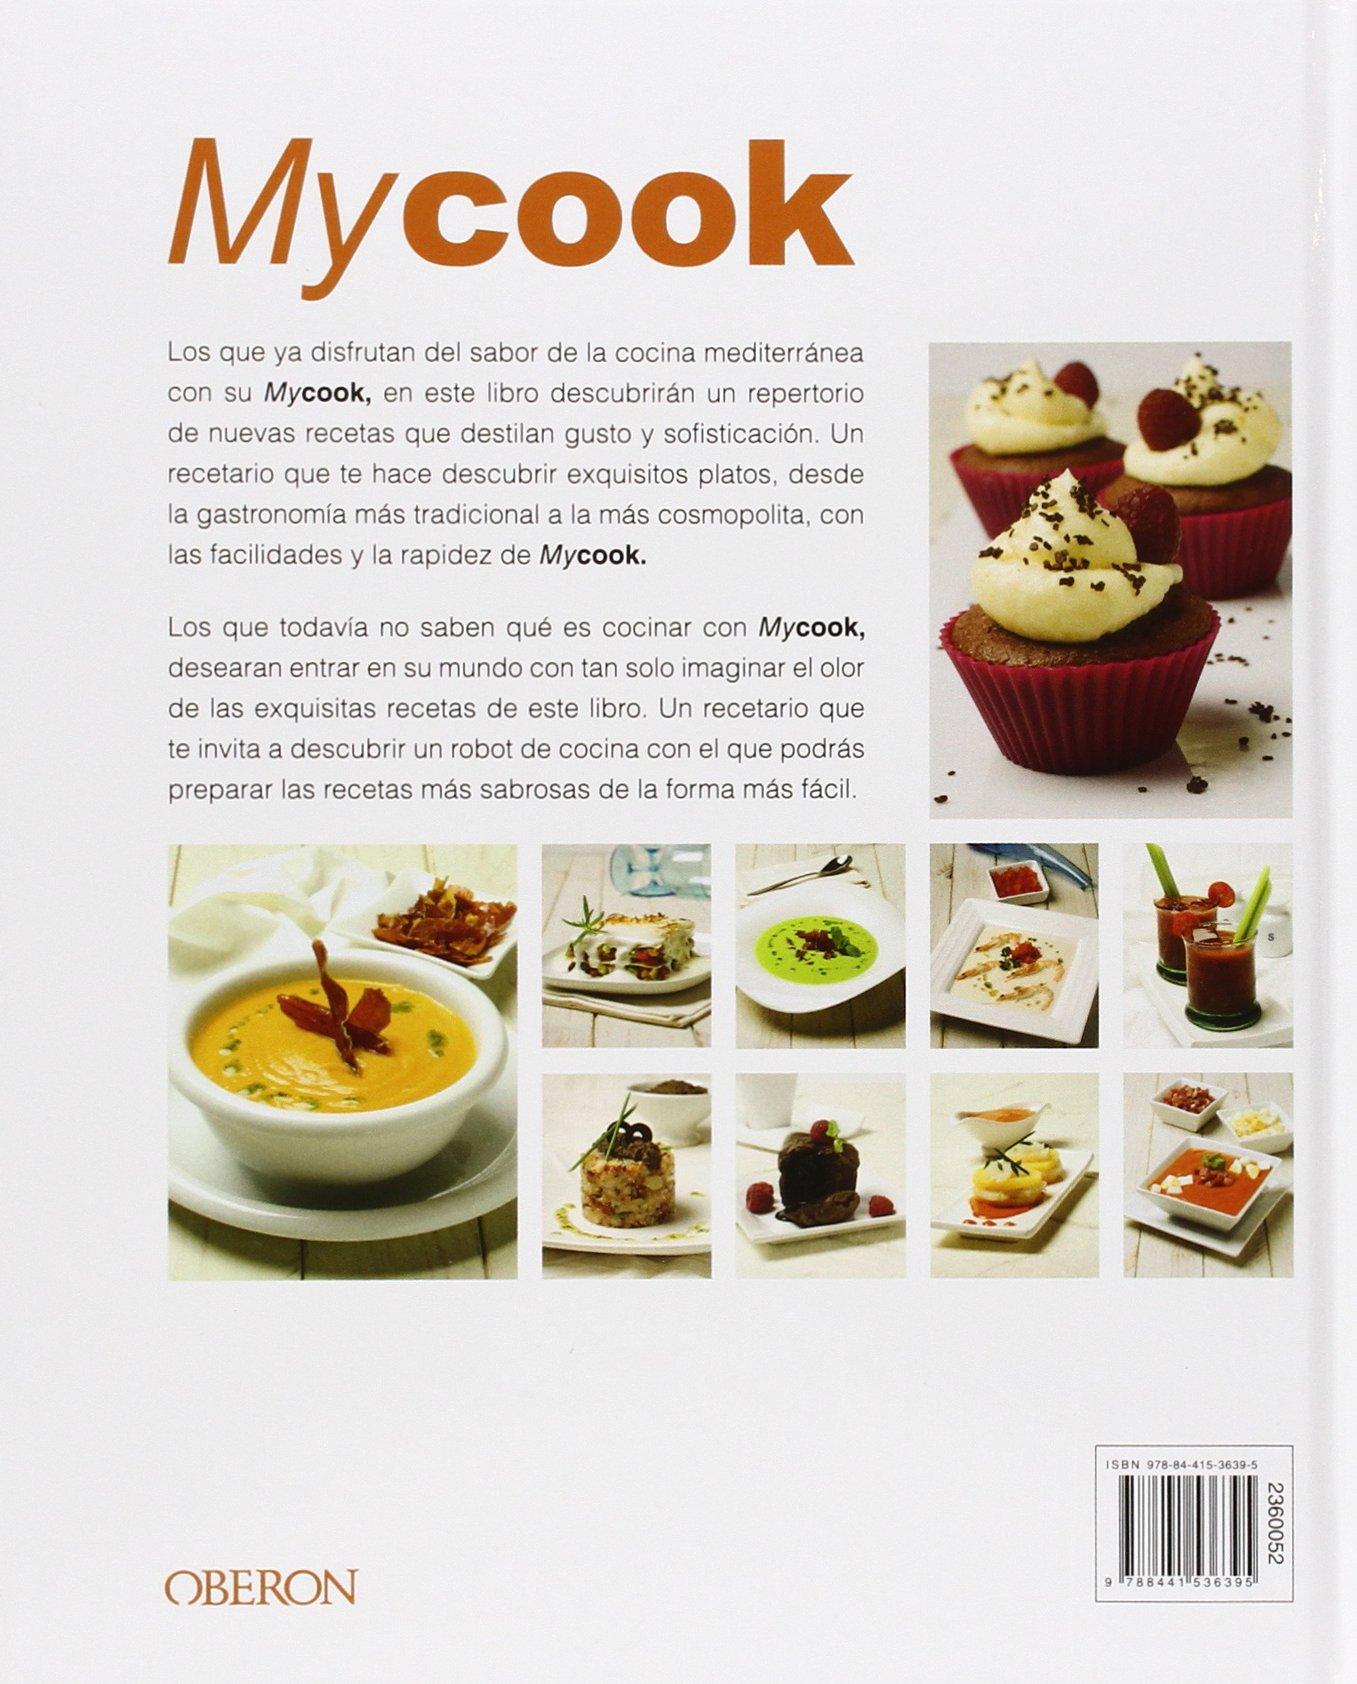 Mycook (Libros Singulares): Amazon.es: Taurus: Libros